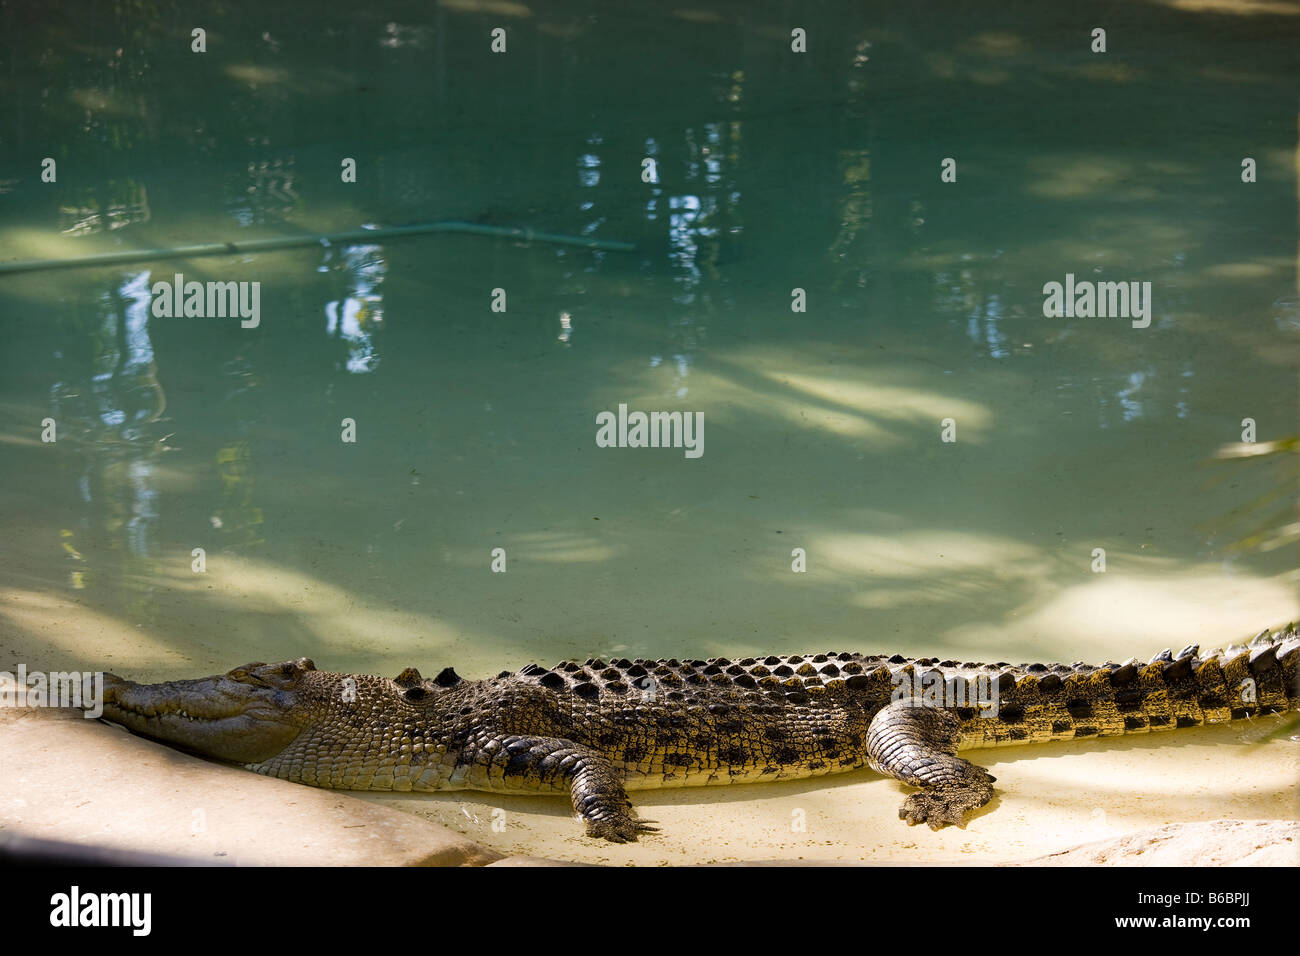 Saltwater Crocodile in The Australia Zoo, the zoo of the Steve Irwin Family near Brisbane Australia. - Stock Image